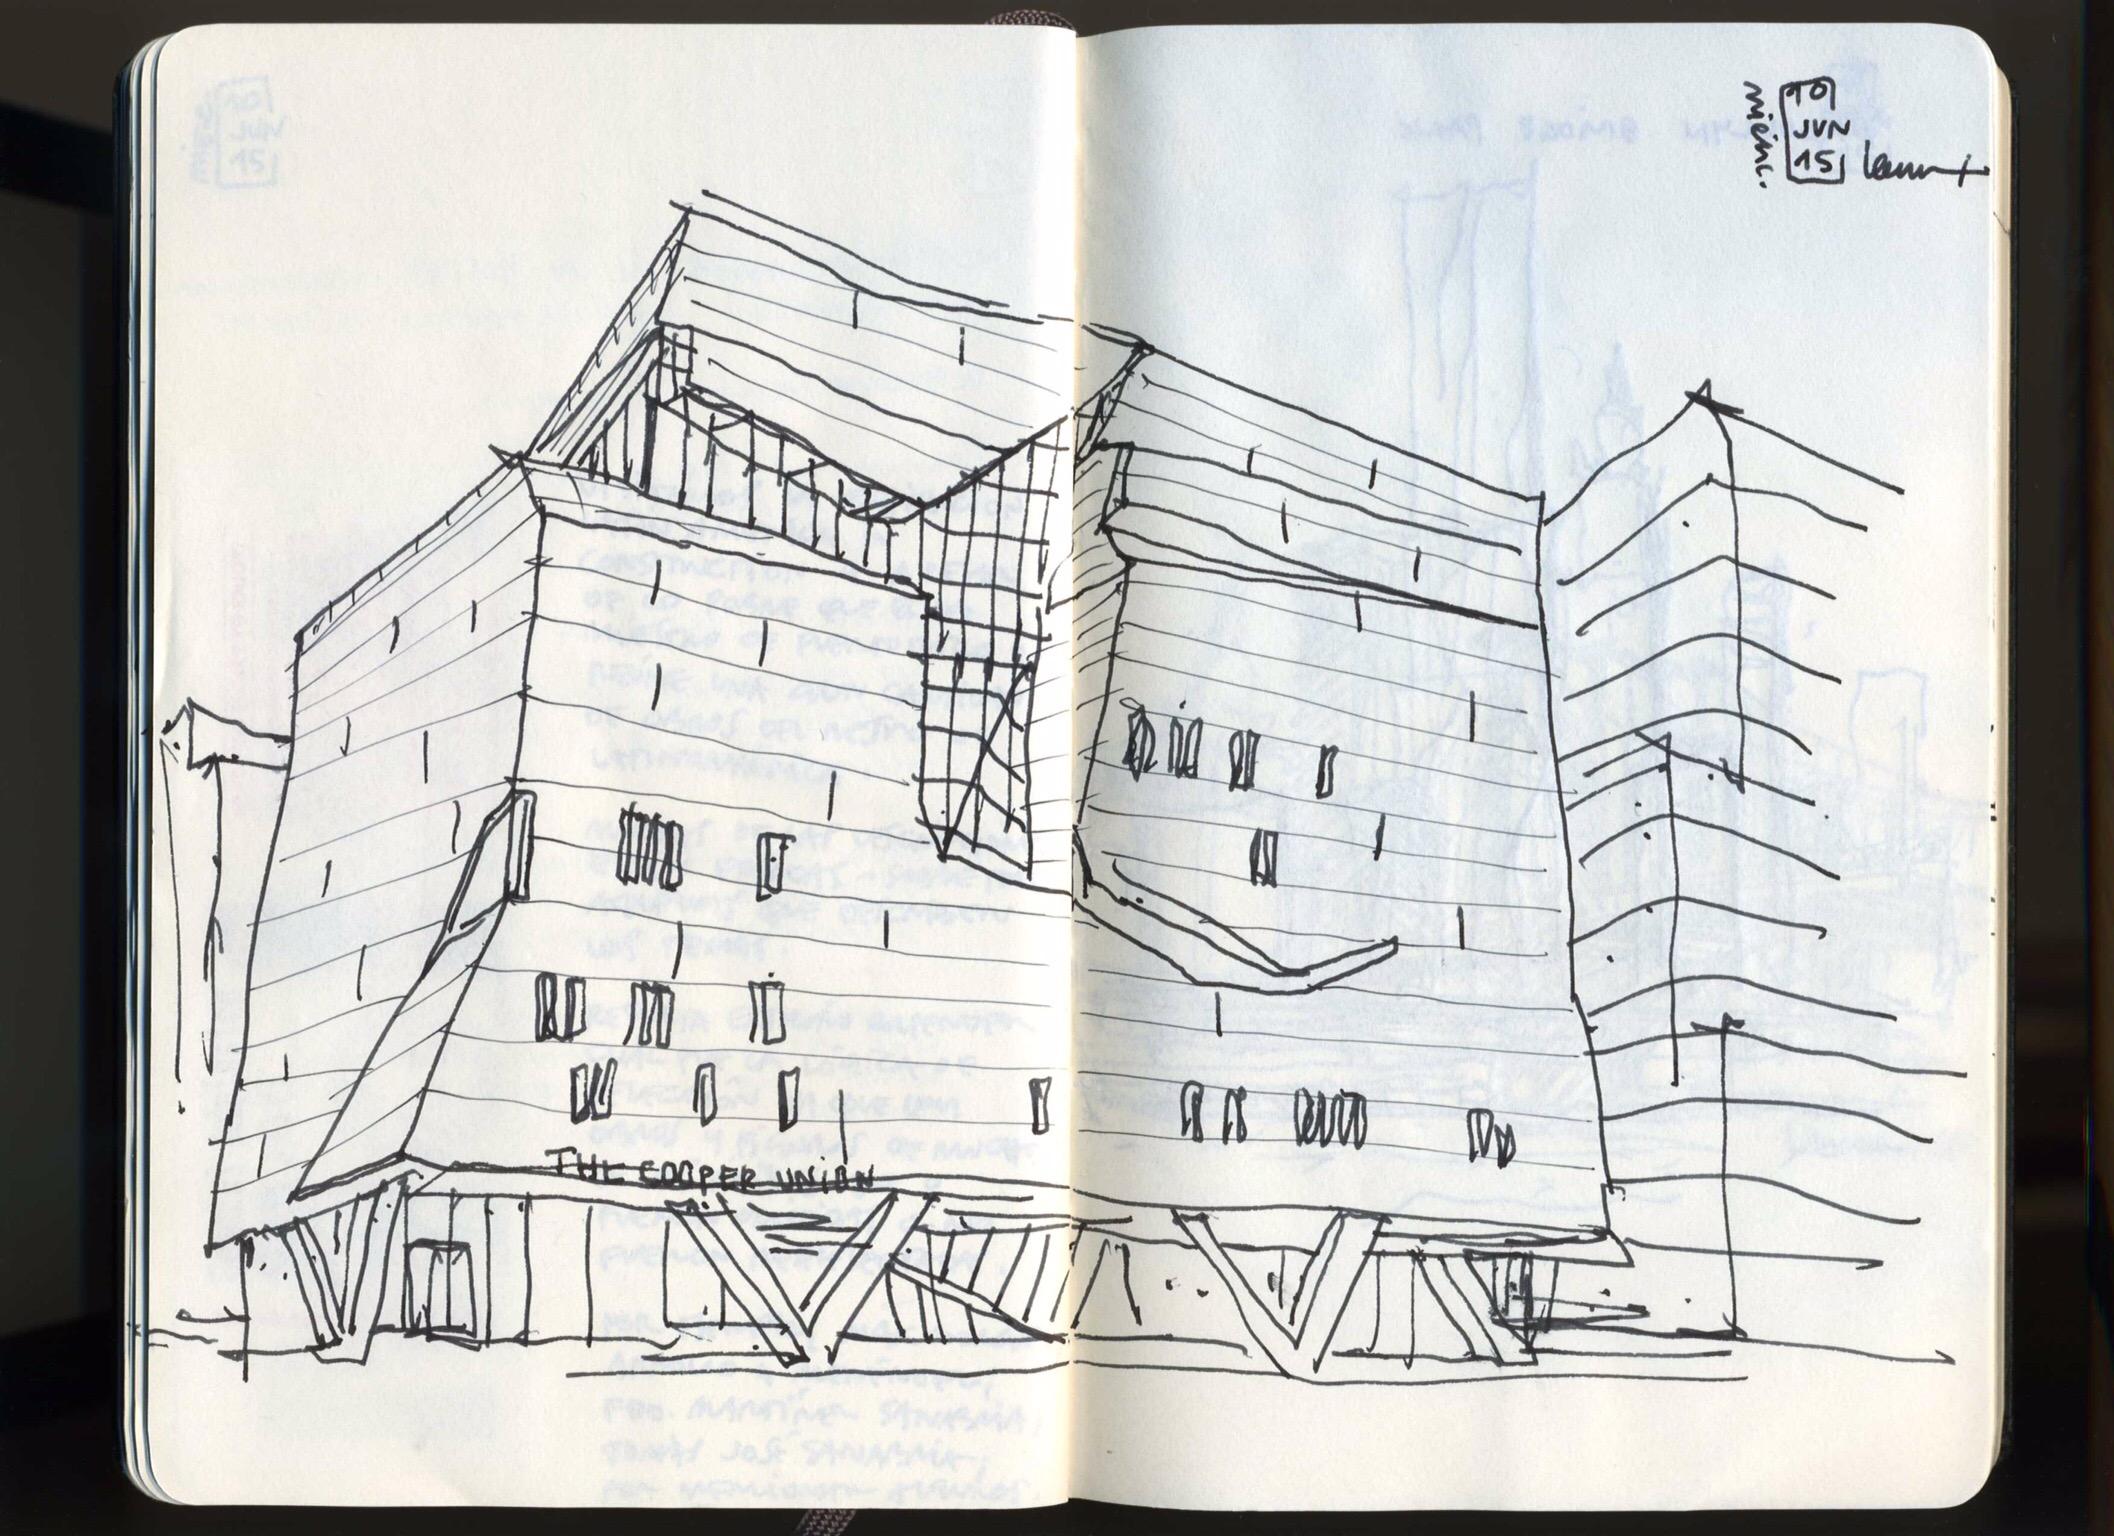 41 Cooper Square  Morphosis Architects  Thom Mayne